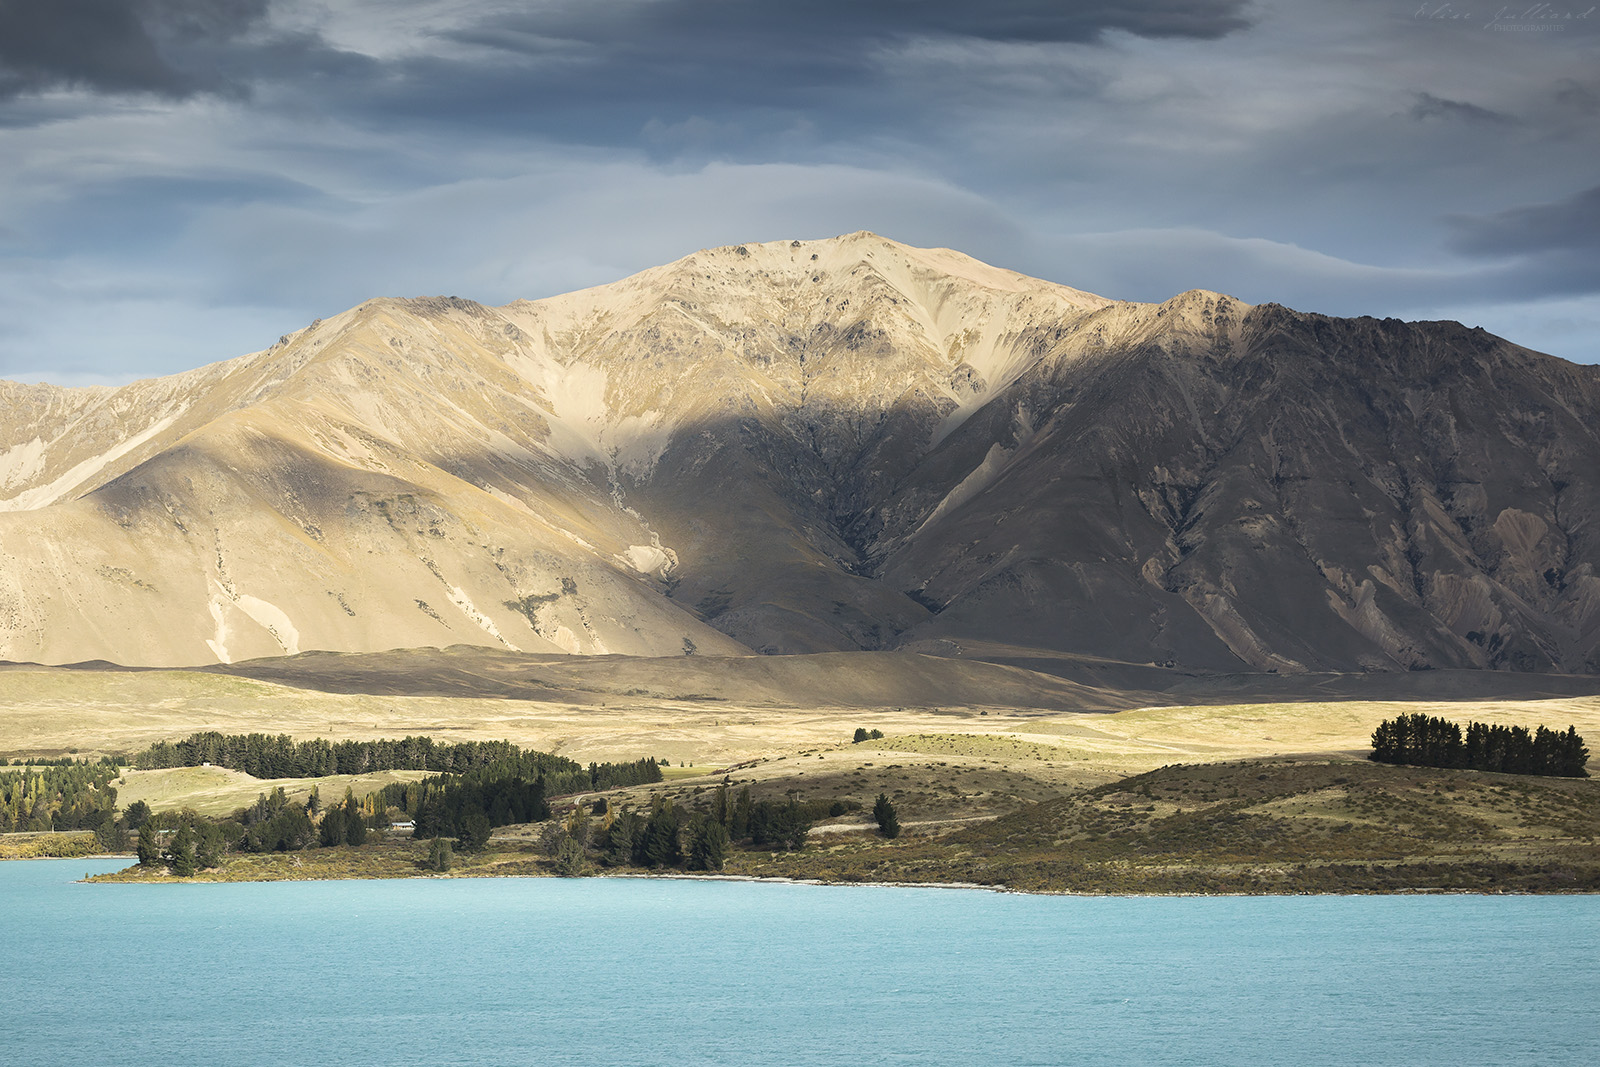 lake-tekapo-new-zealand-nouvelle-zelande-mackenzie-canterbury-south-island-southern-alps-dark-sky-reserve-mont-john-montagne-mountain-travel-voyage